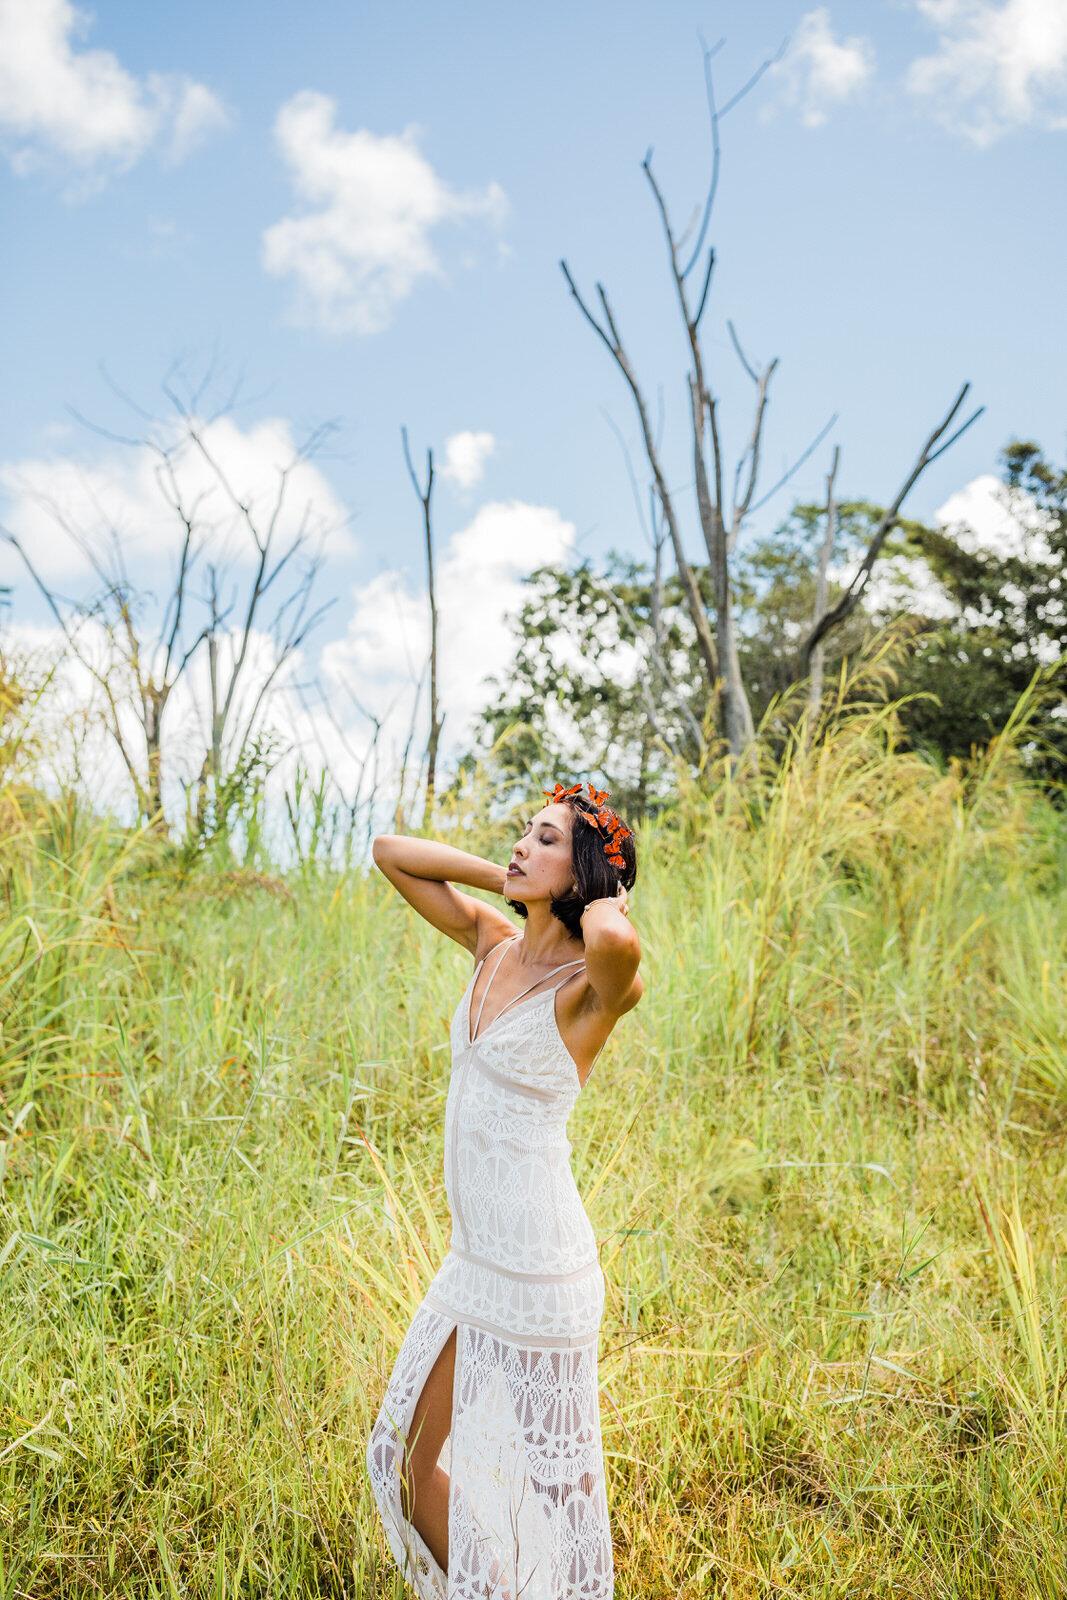 jewlery-small-business-collaboration-model-freelance-hilo-big-island-9267.jpg